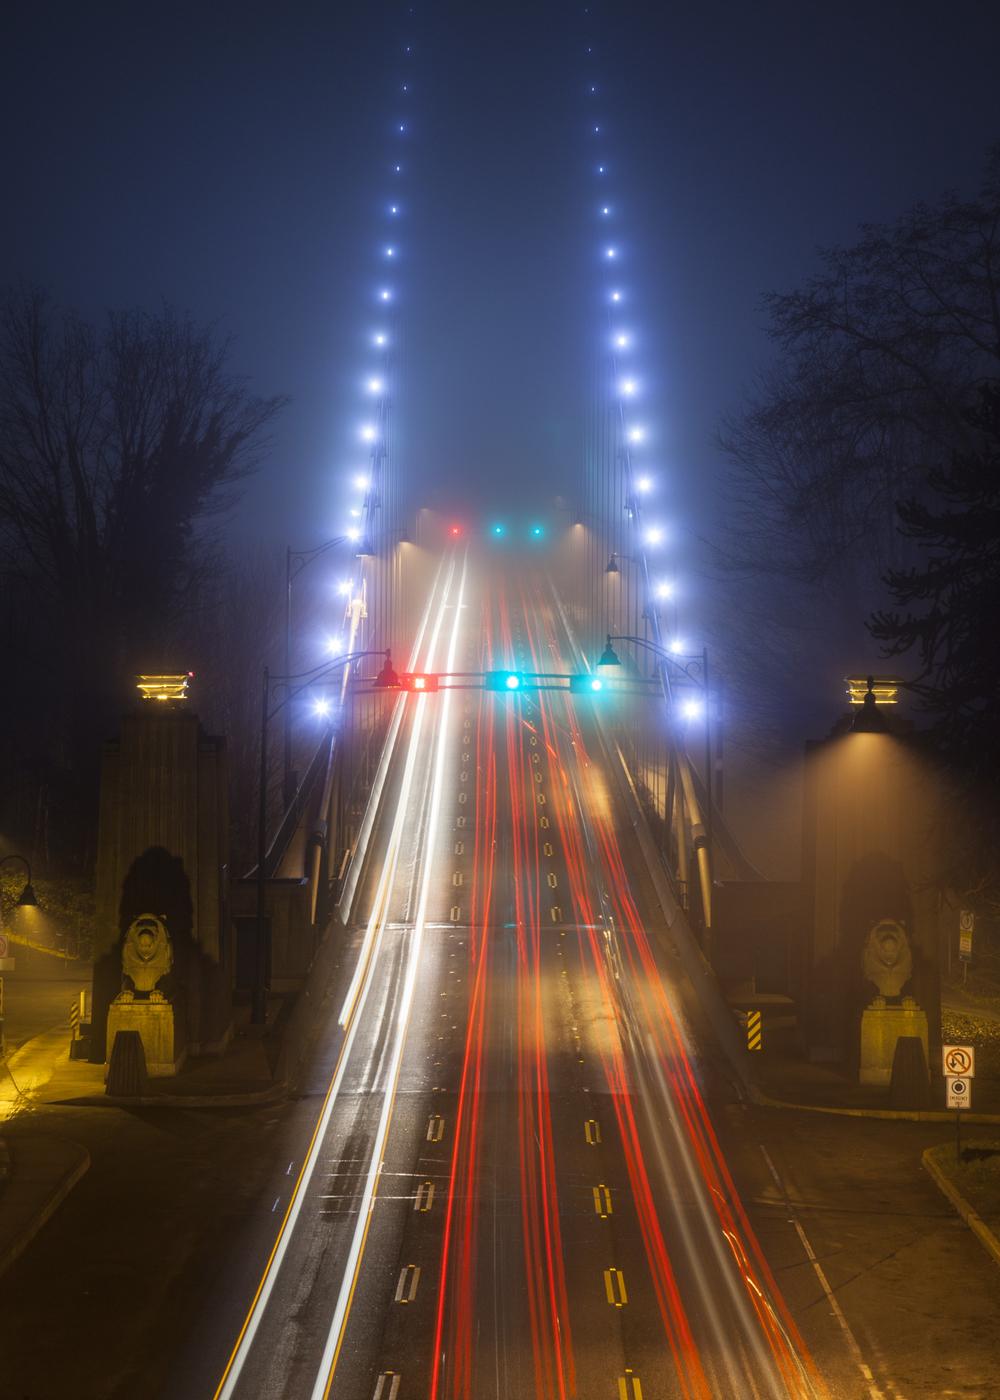 Lion's Gate Bridge in the fog.